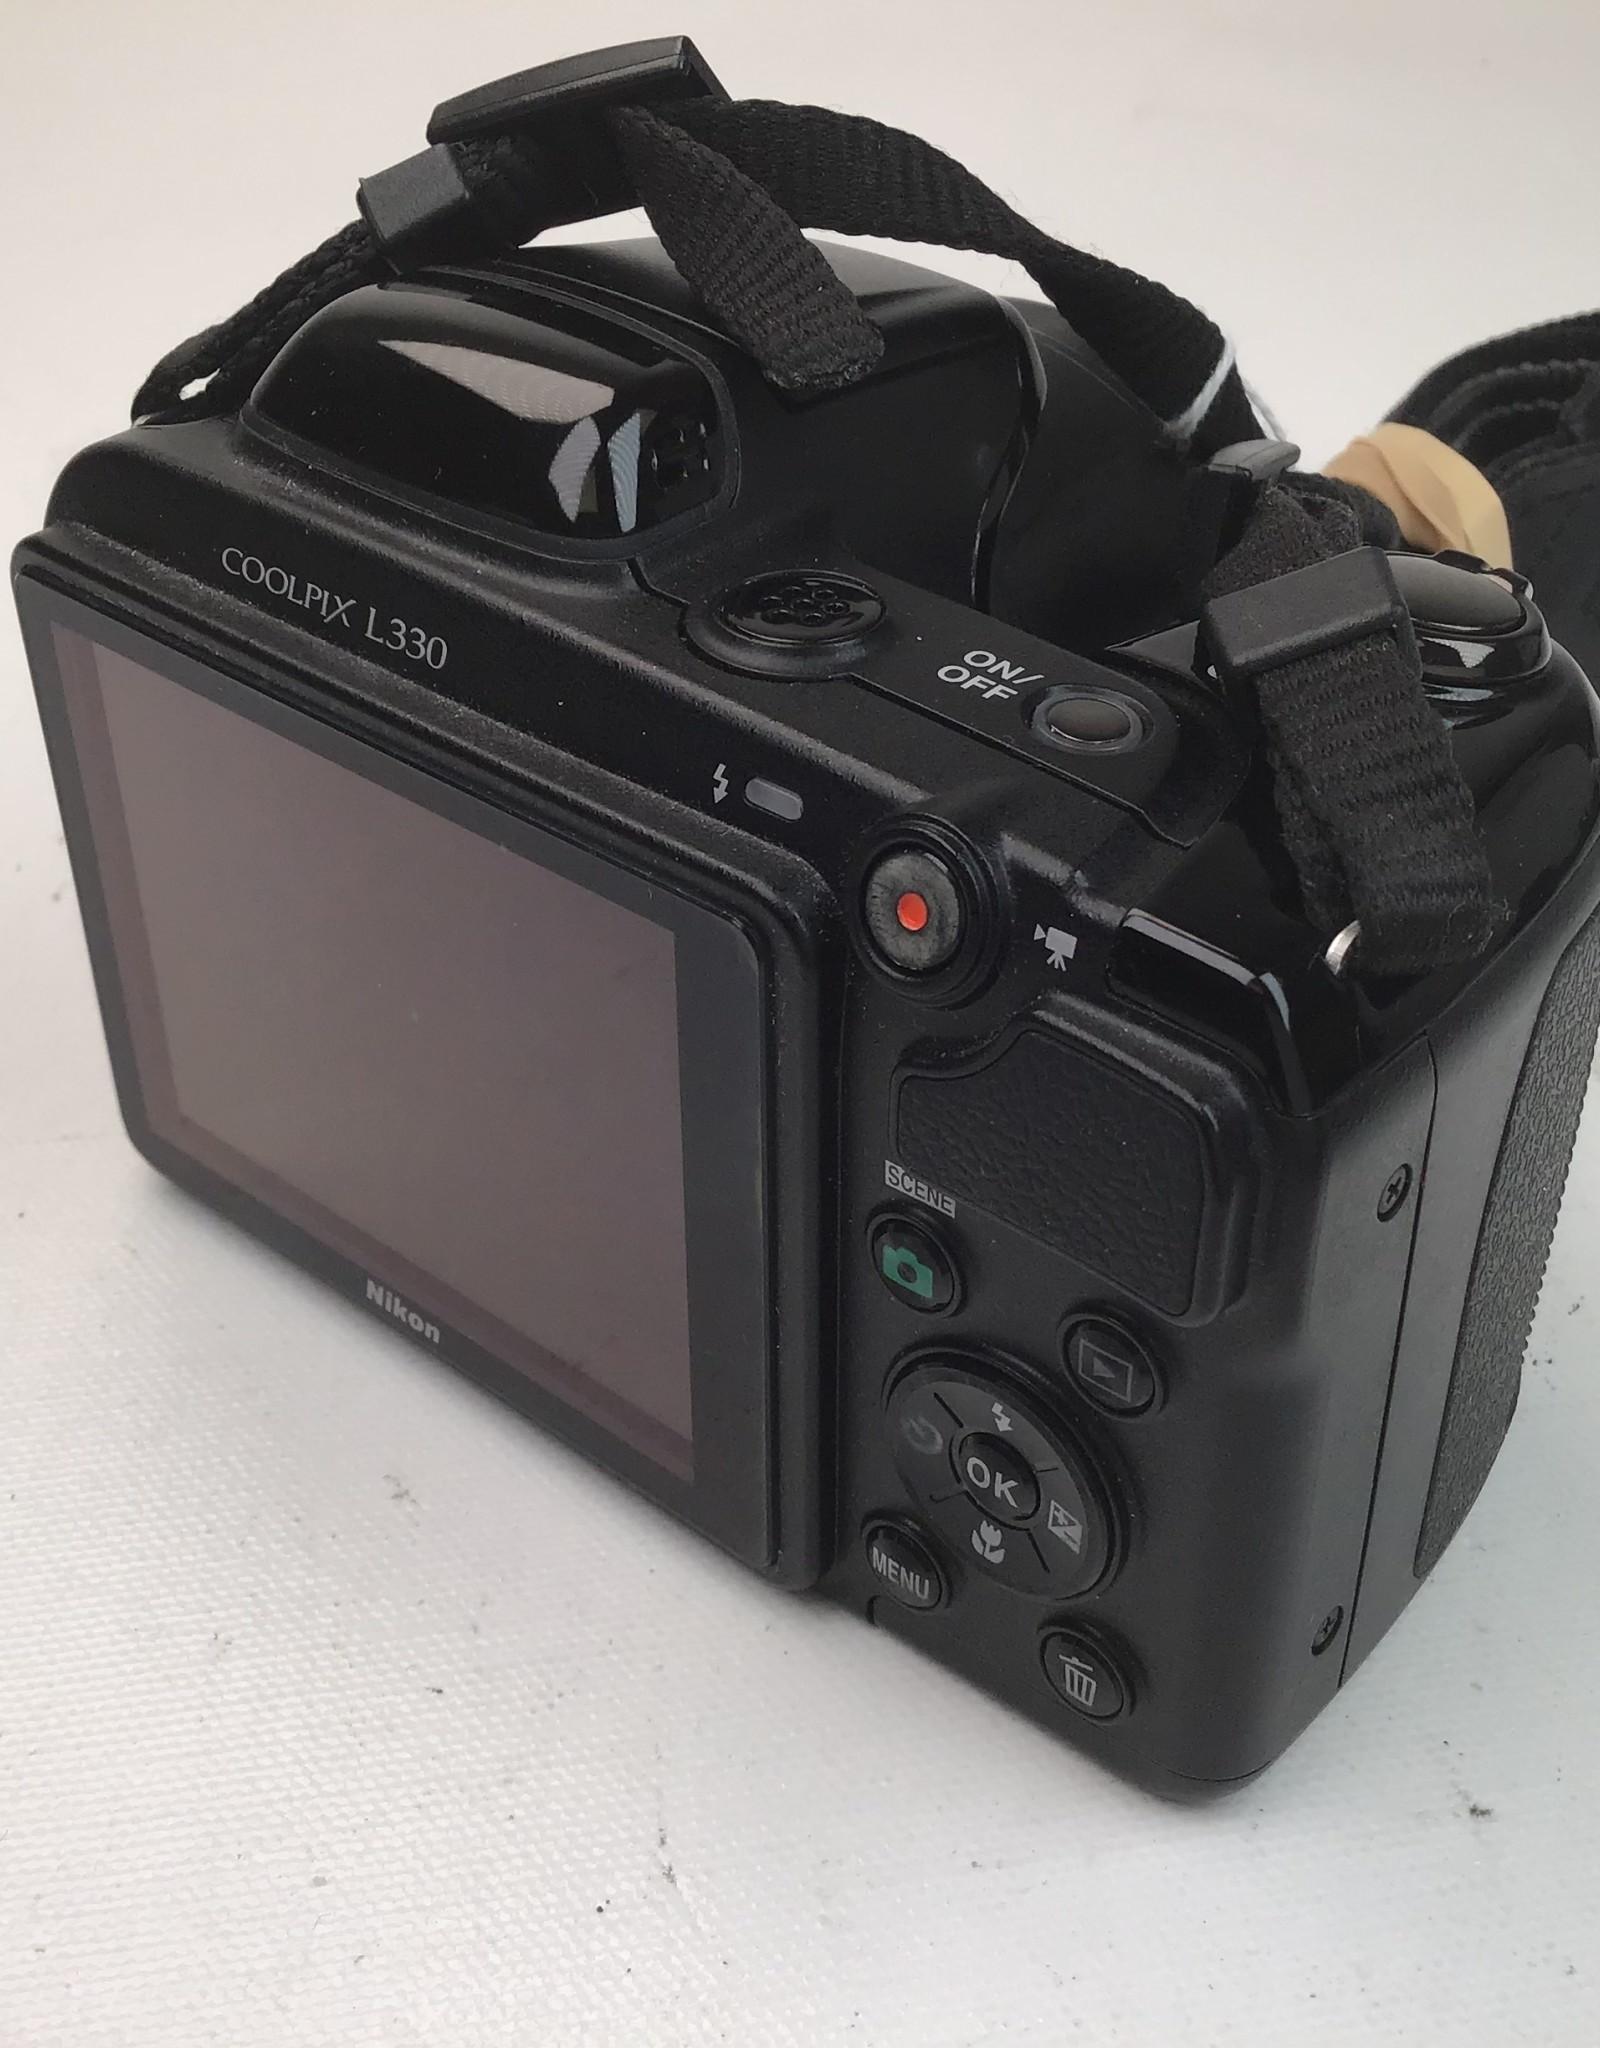 NIKON Nikon Coolpix L30 Digital Camera Used Fair